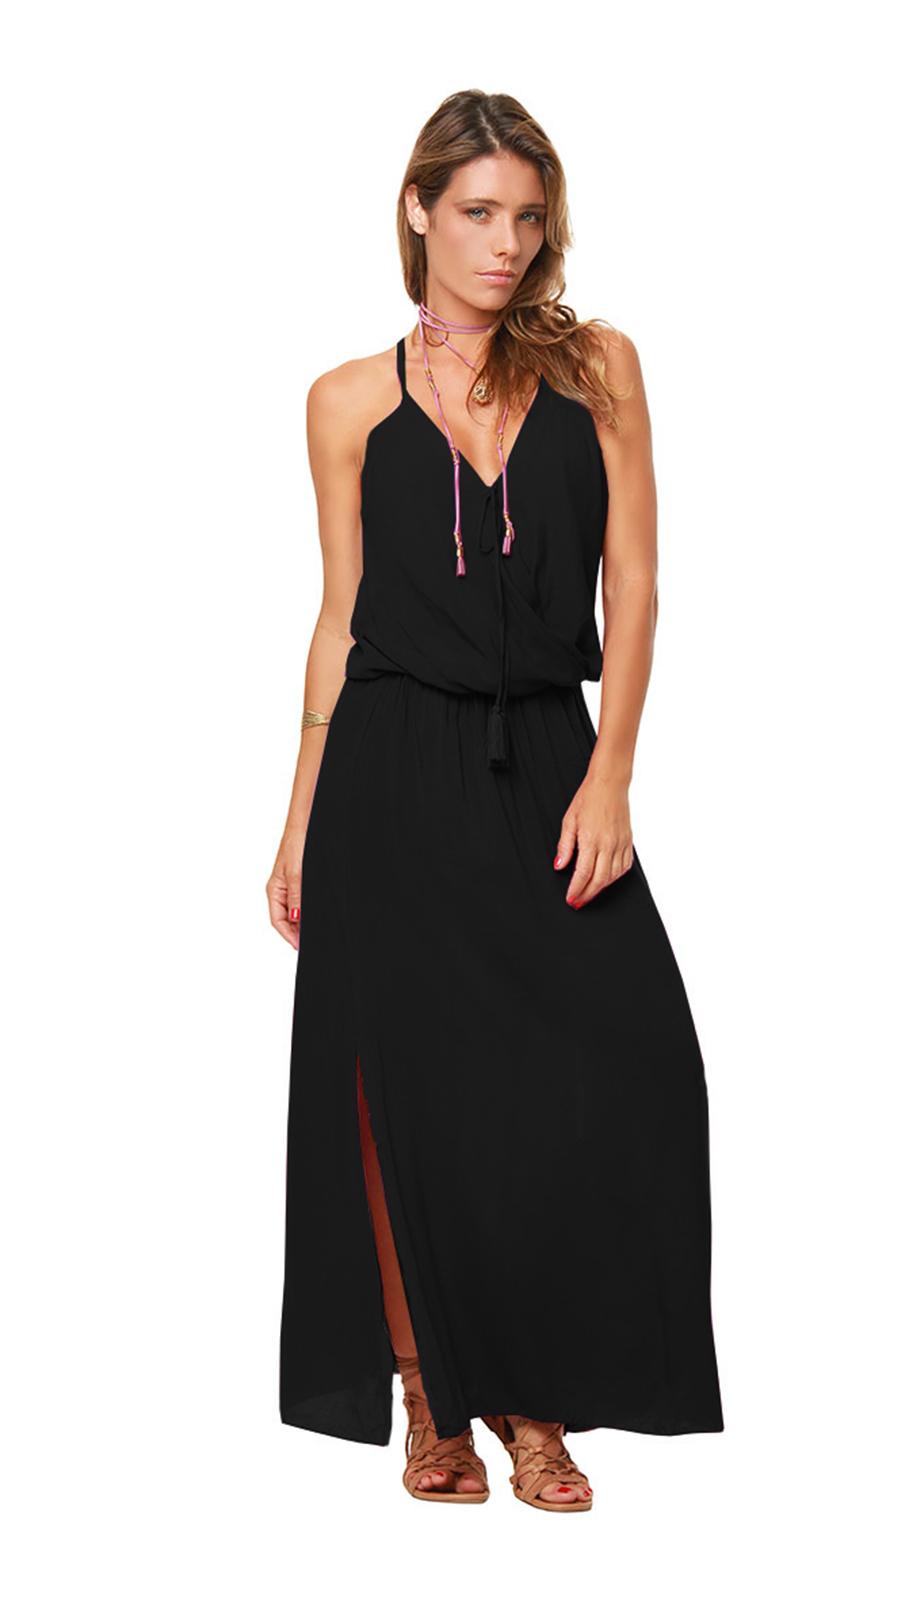 Sunstar Dress - Black - Front